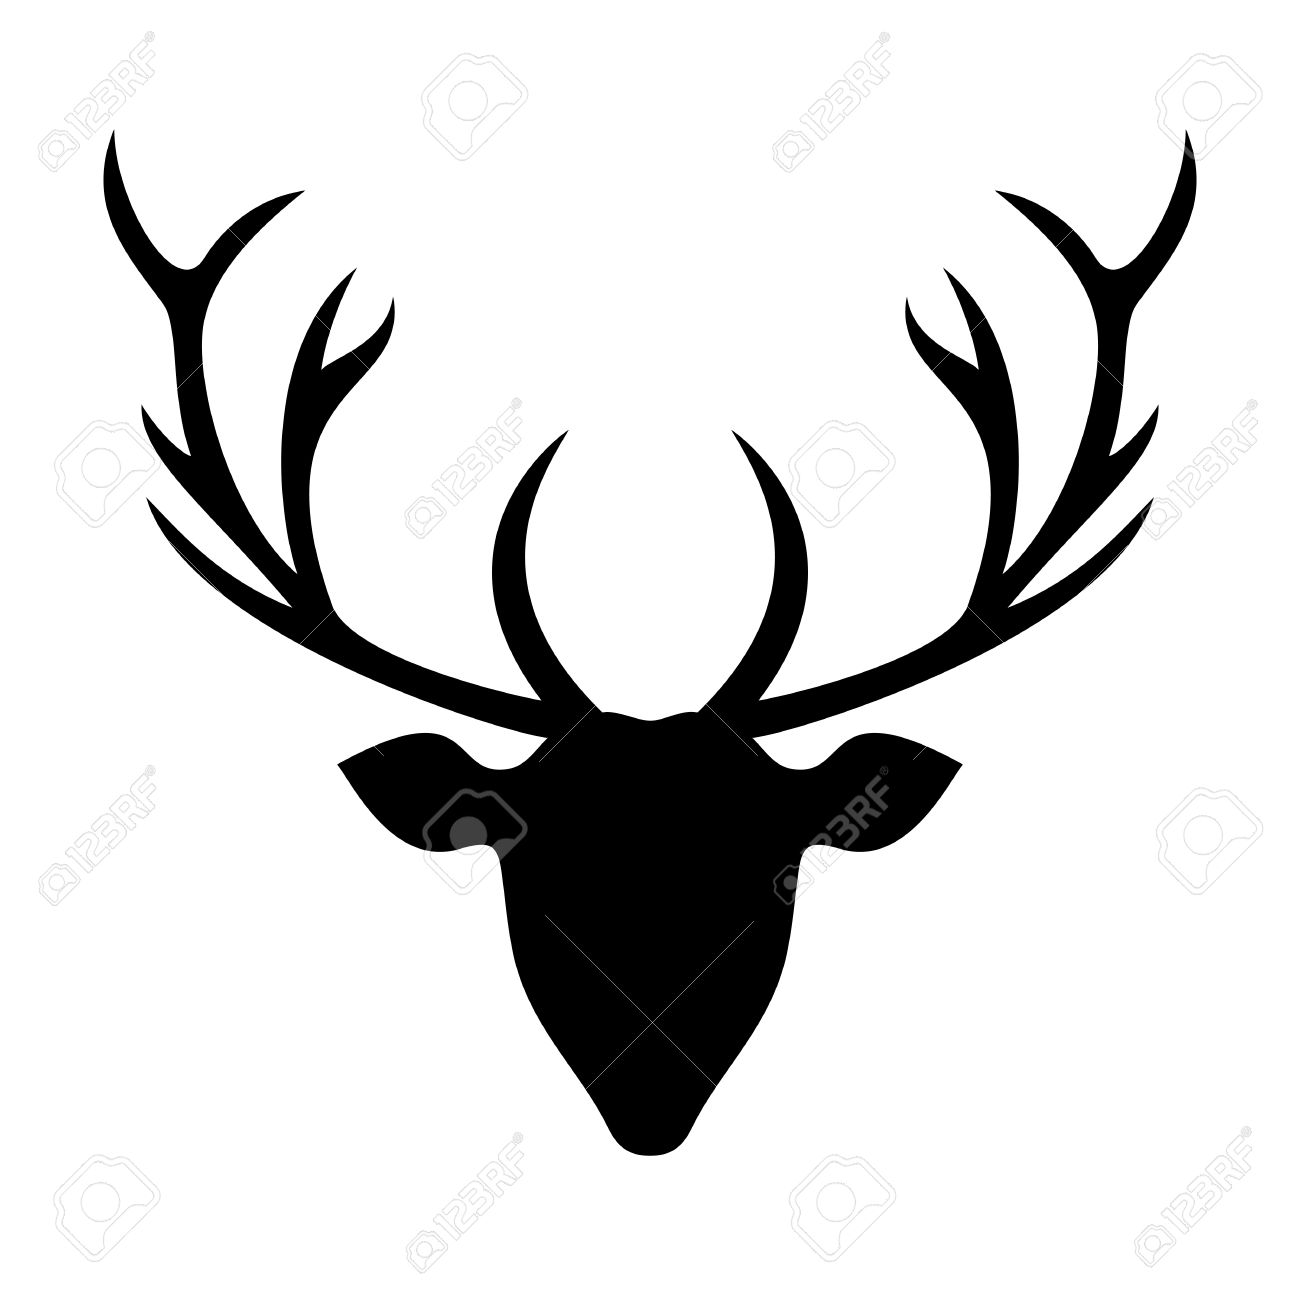 graphic about Deer Head Silhouette Printable titled Invigorating Deer Mind Silhouette Inventory Vector Deer Brain